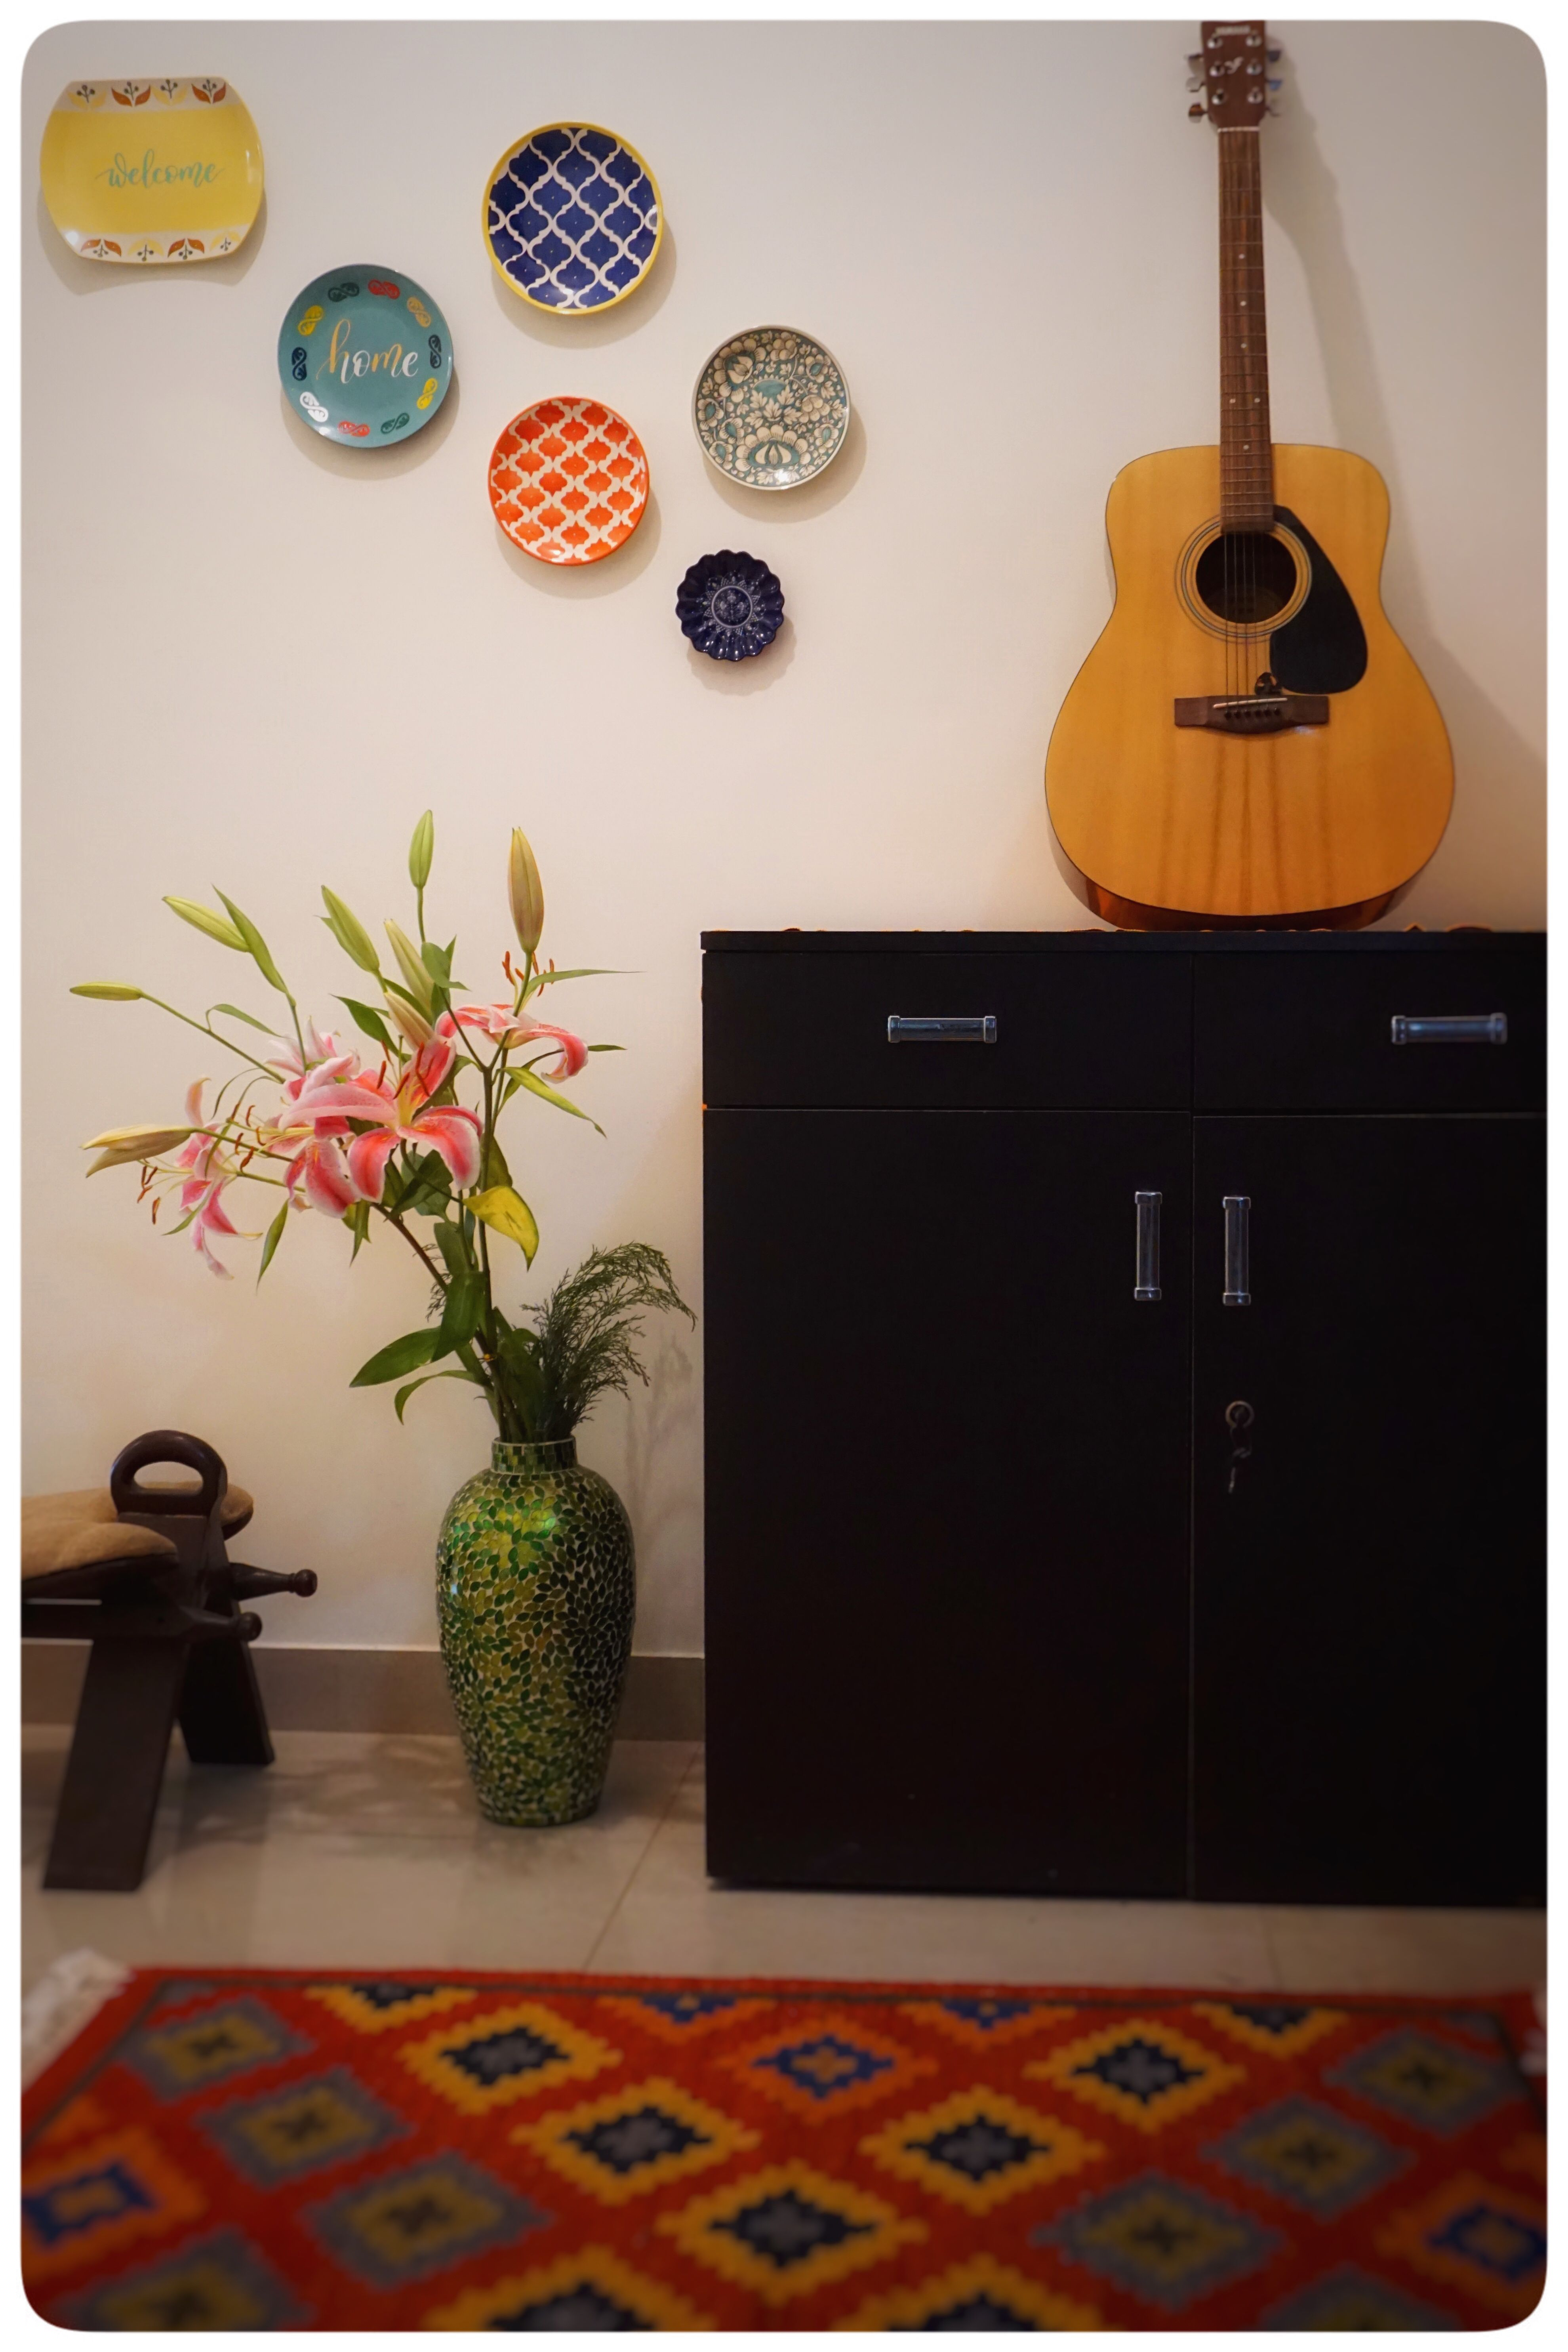 Wall Plates Decor Ceramic Plate Art